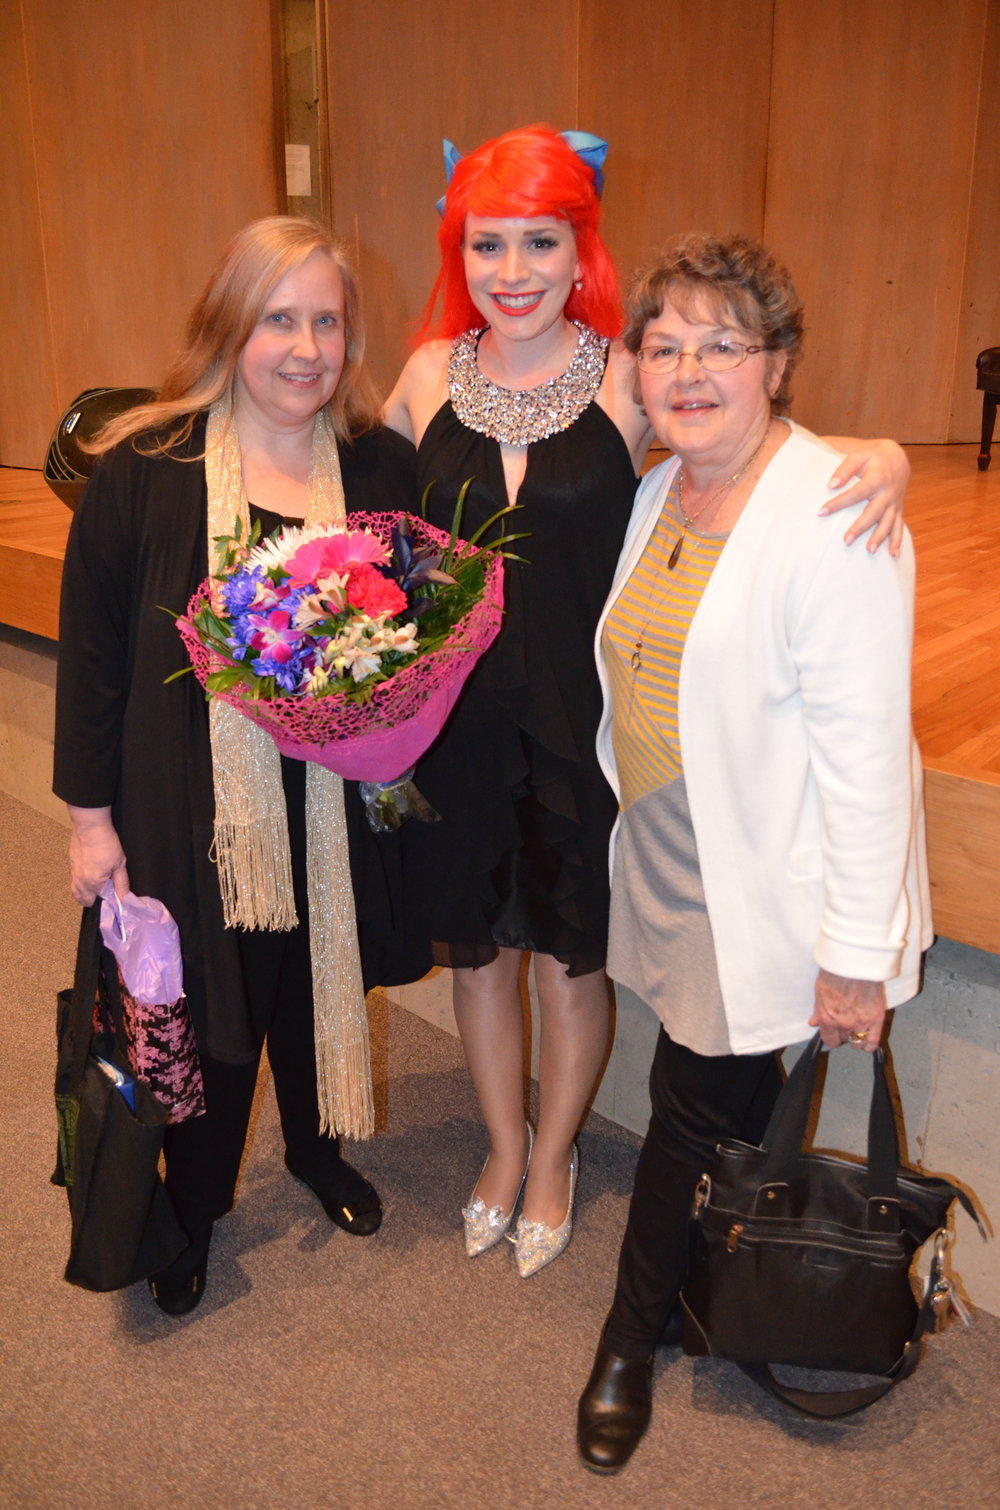 2016-04-29_GVPAF Musical Theatre Honours Concert (1).JPG